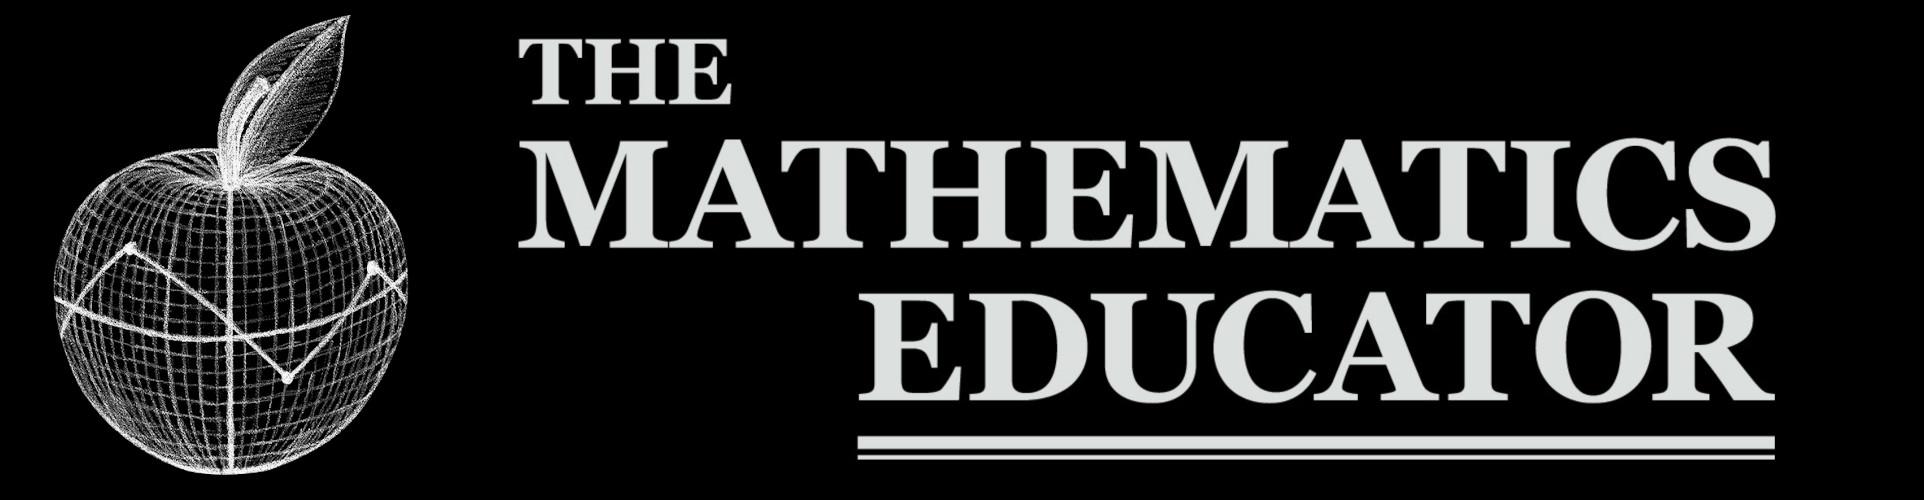 Apple Logo for The Mathematics Educator